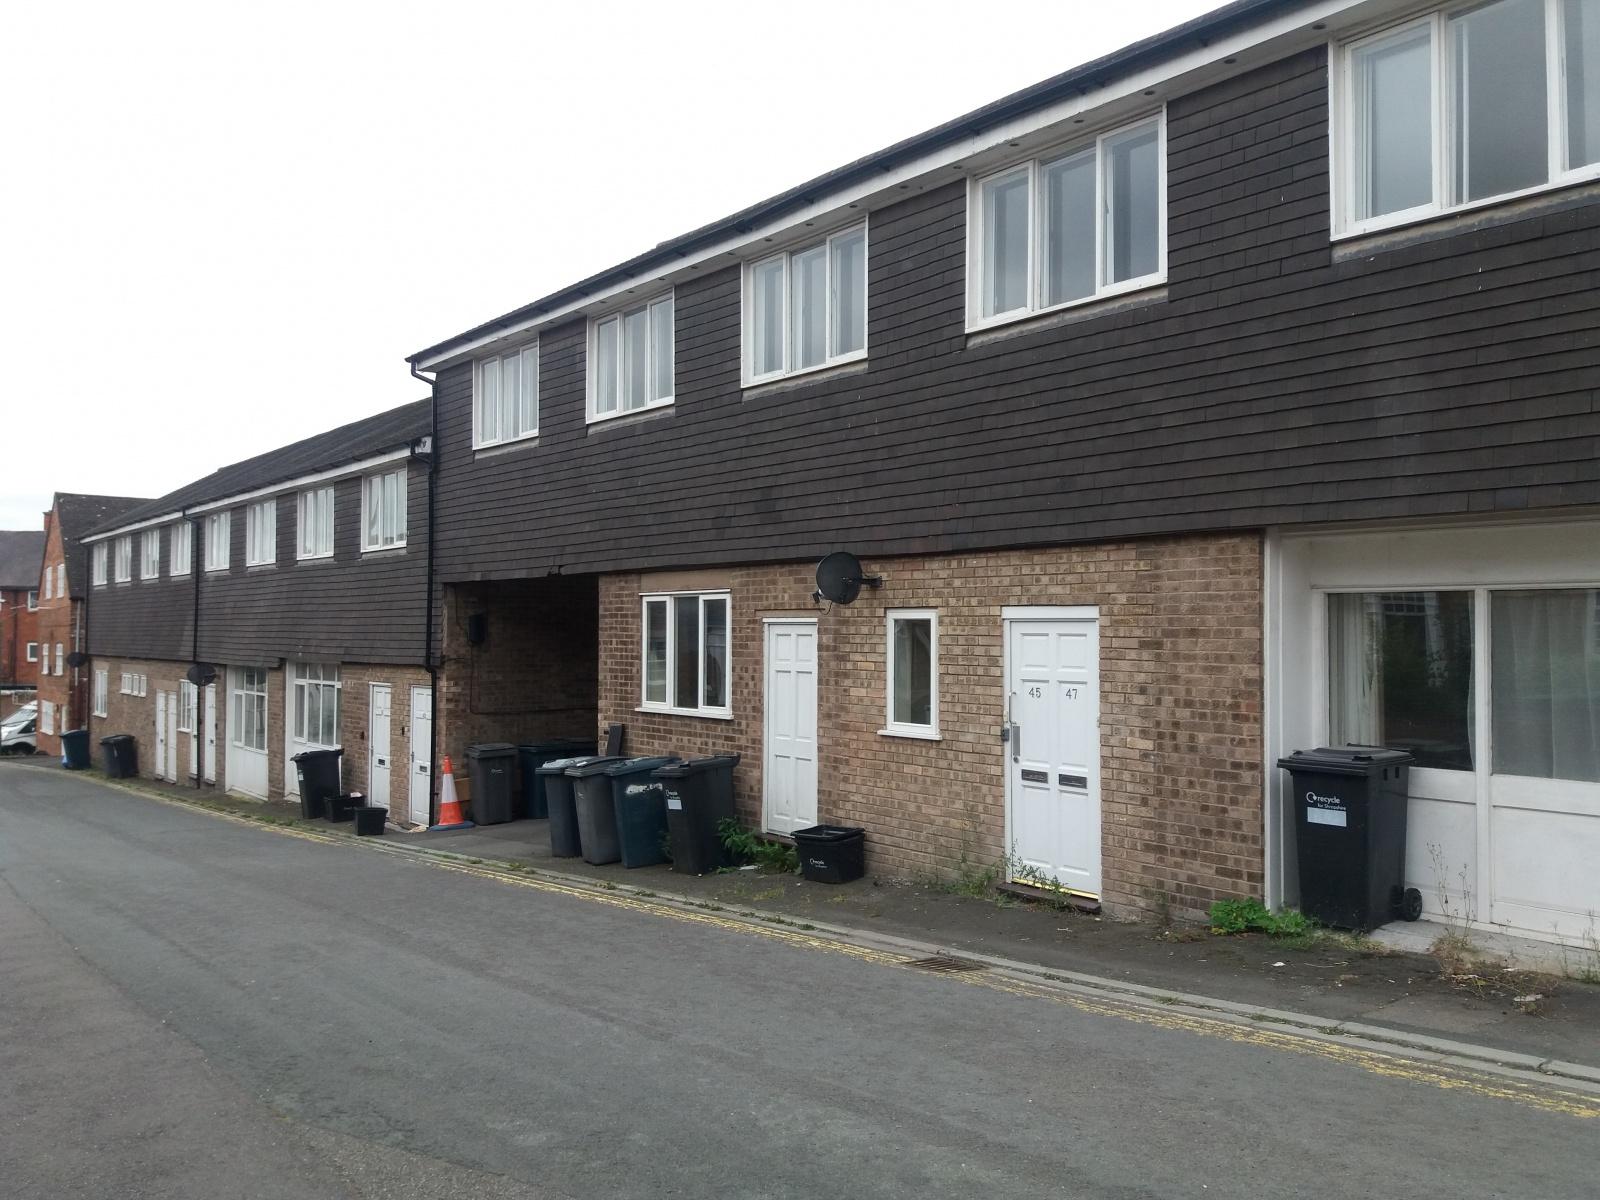 33-49 Nettles Lane, Shrewsbury, Shropshire